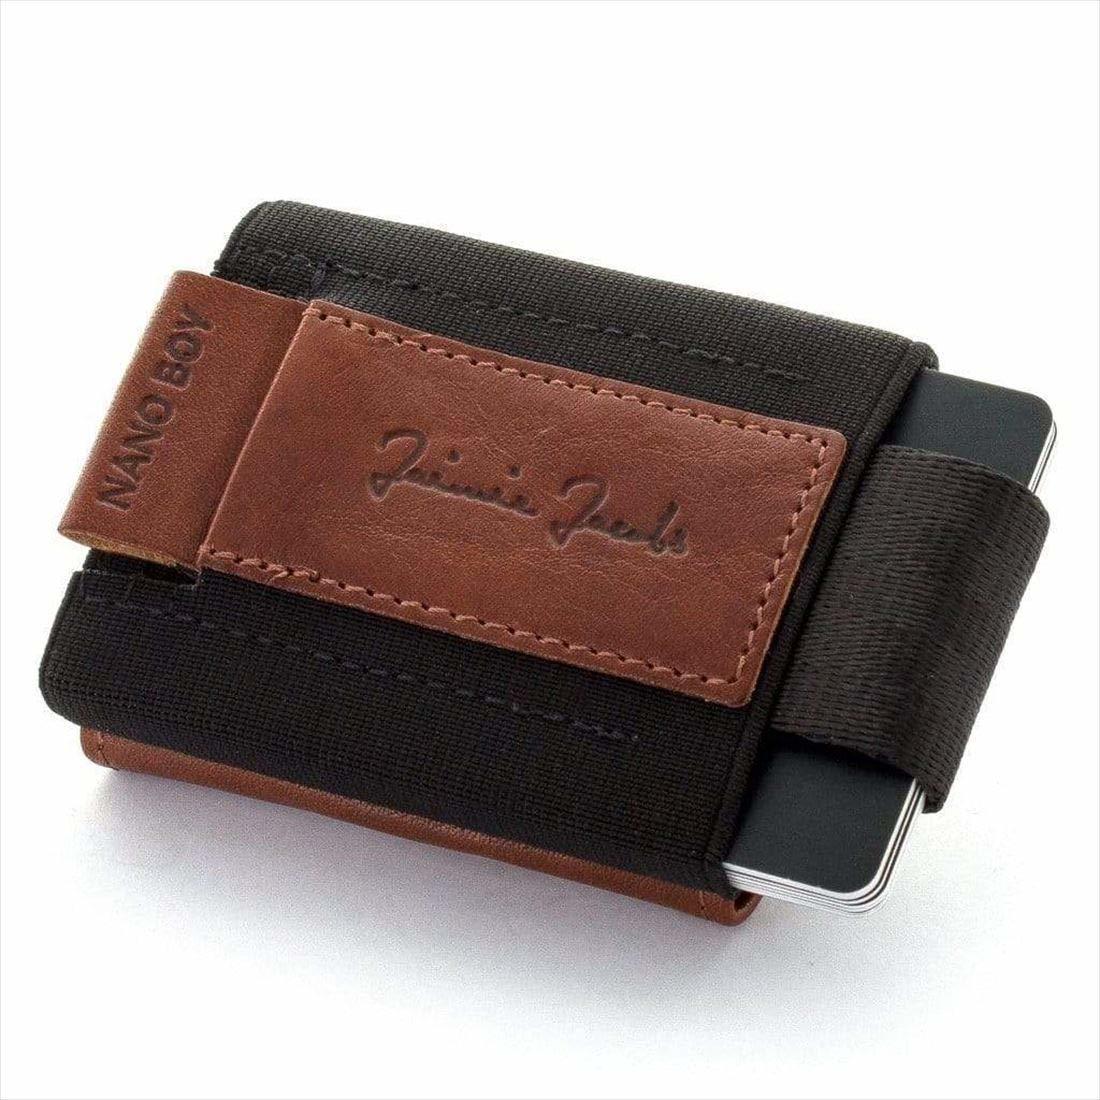 Jaimie Jacobs NANO BOY POCKET コンパクト財布 ( マネークリップ 小銭入れ カードケース ギフトボックス付き) 正規輸入品 (日本独占販売権取得)